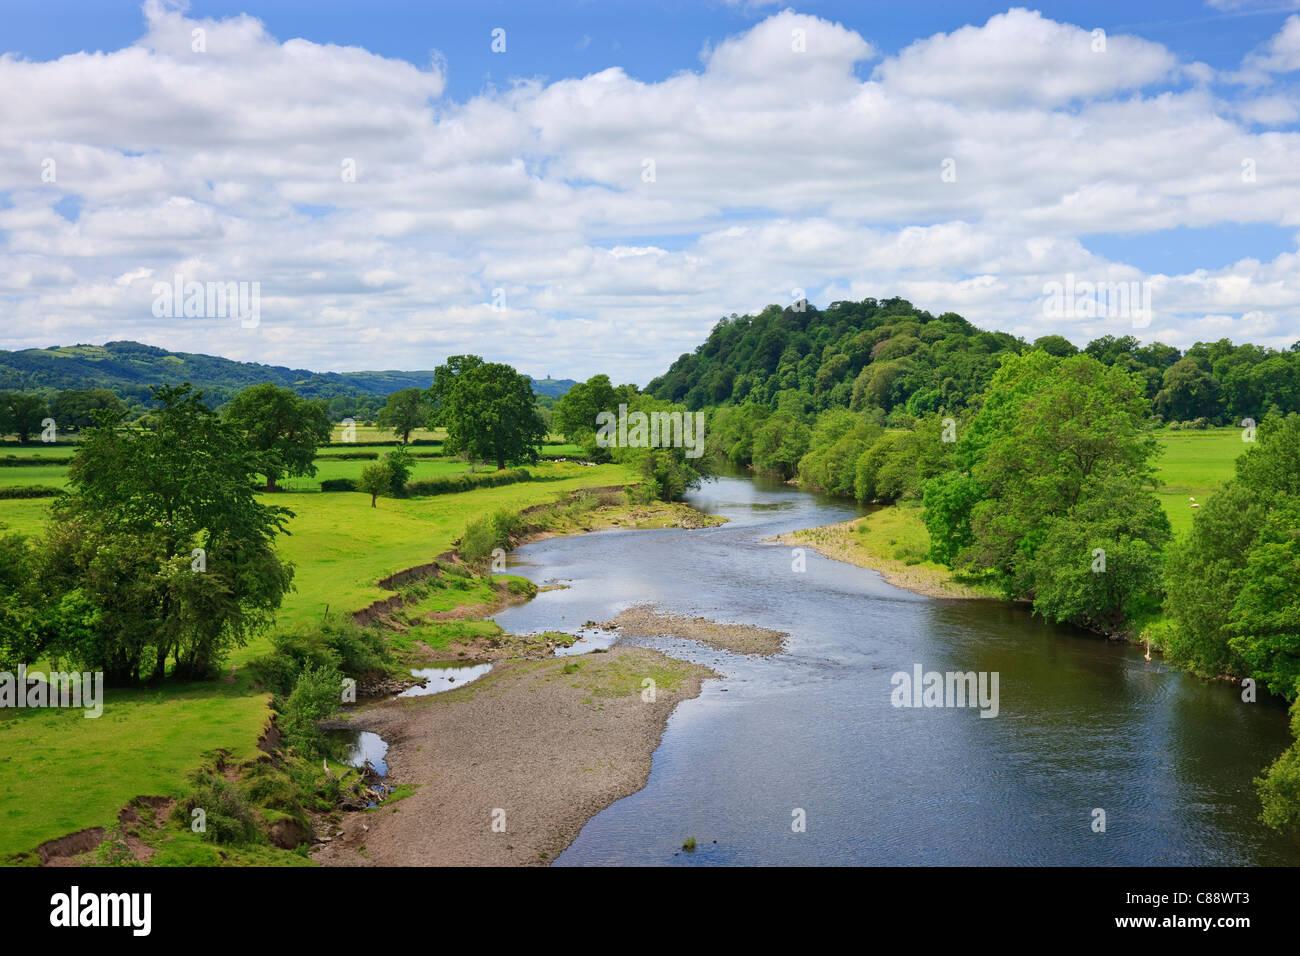 River Towy Llandeilo Carmarthenshire Wales - Stock Image